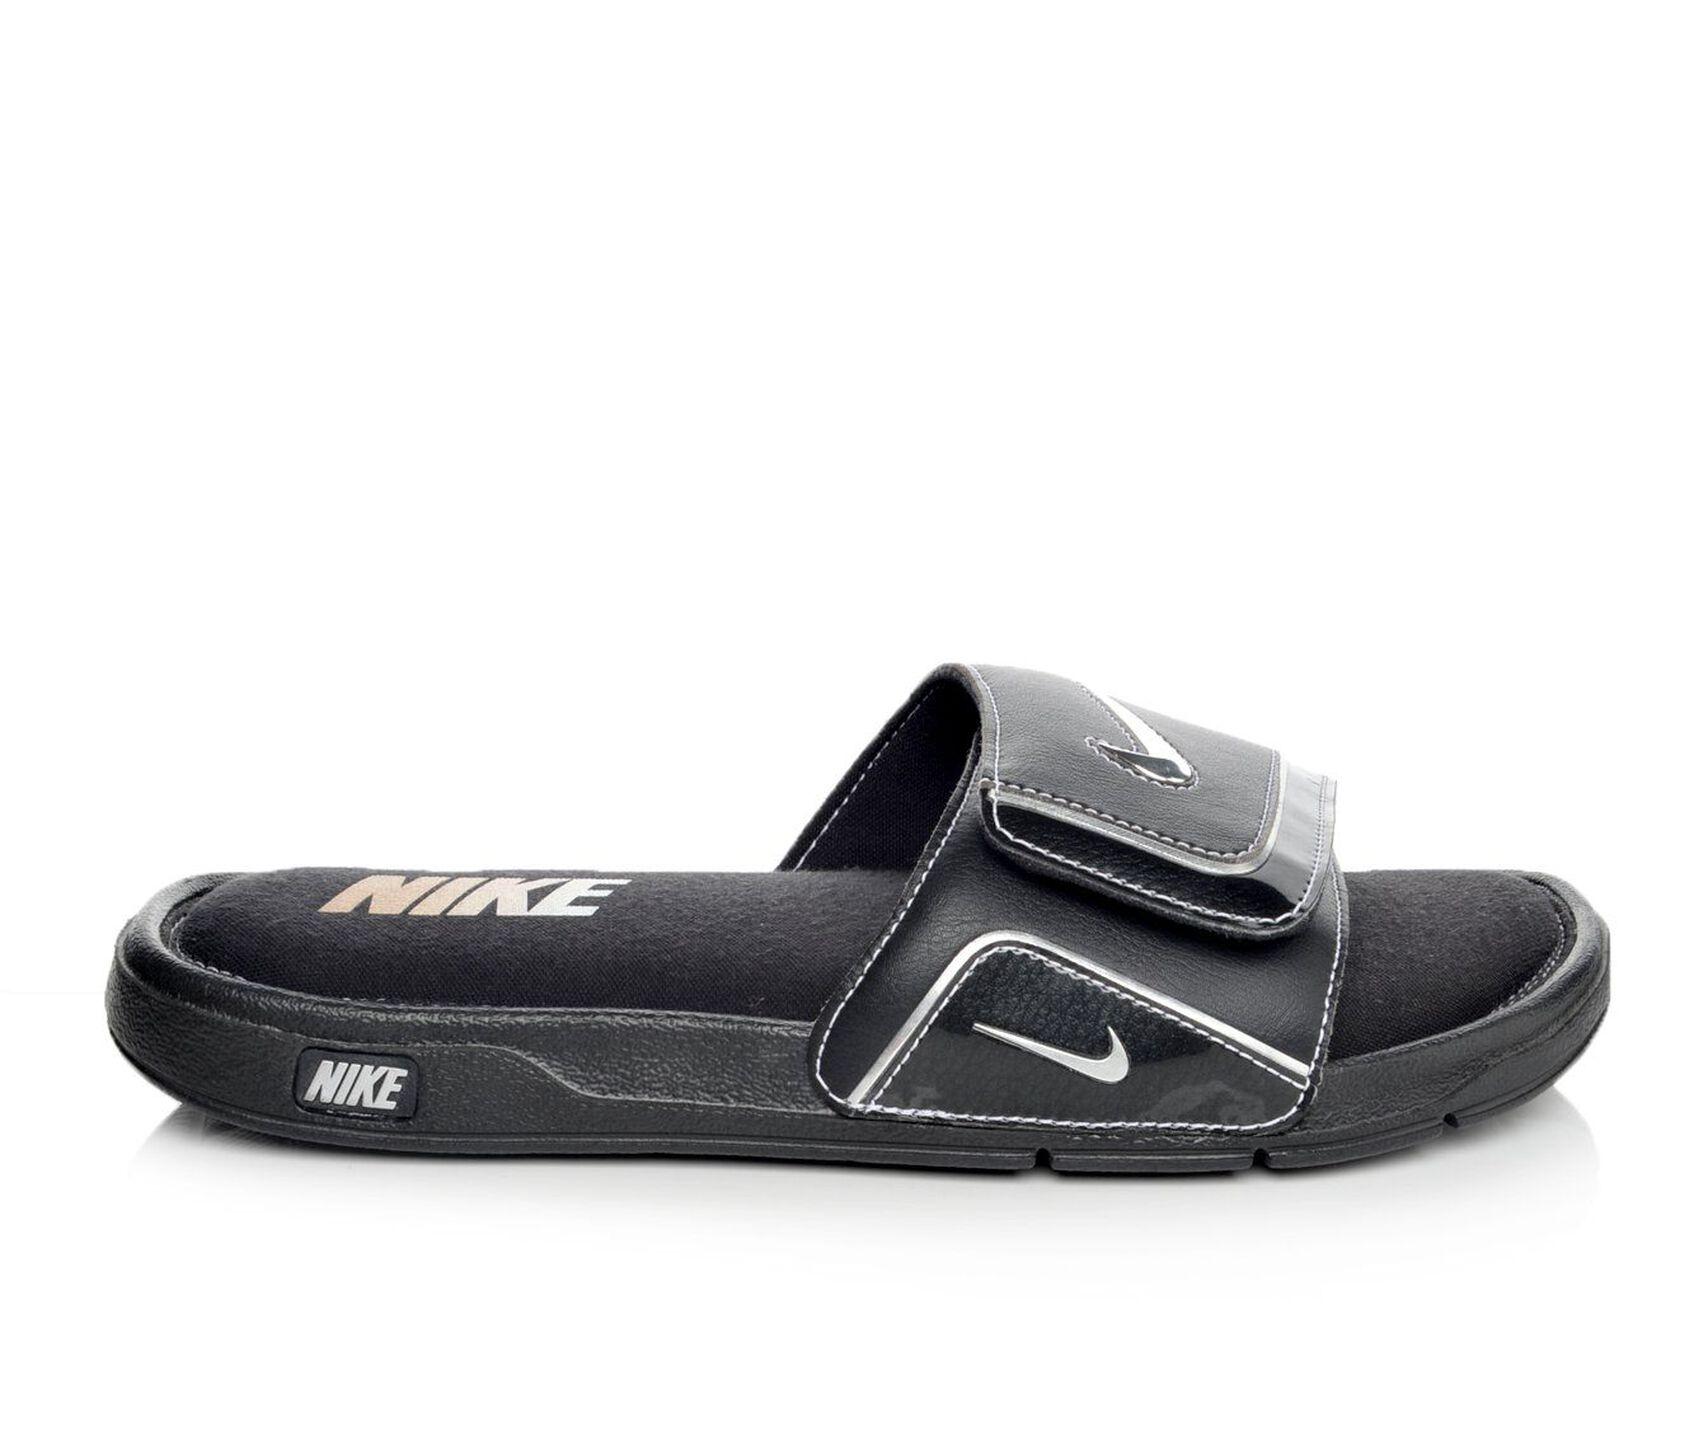 p menpuma nike men sale comfort shoes clearance puma salesuperior superior quality slide sandal for comforter